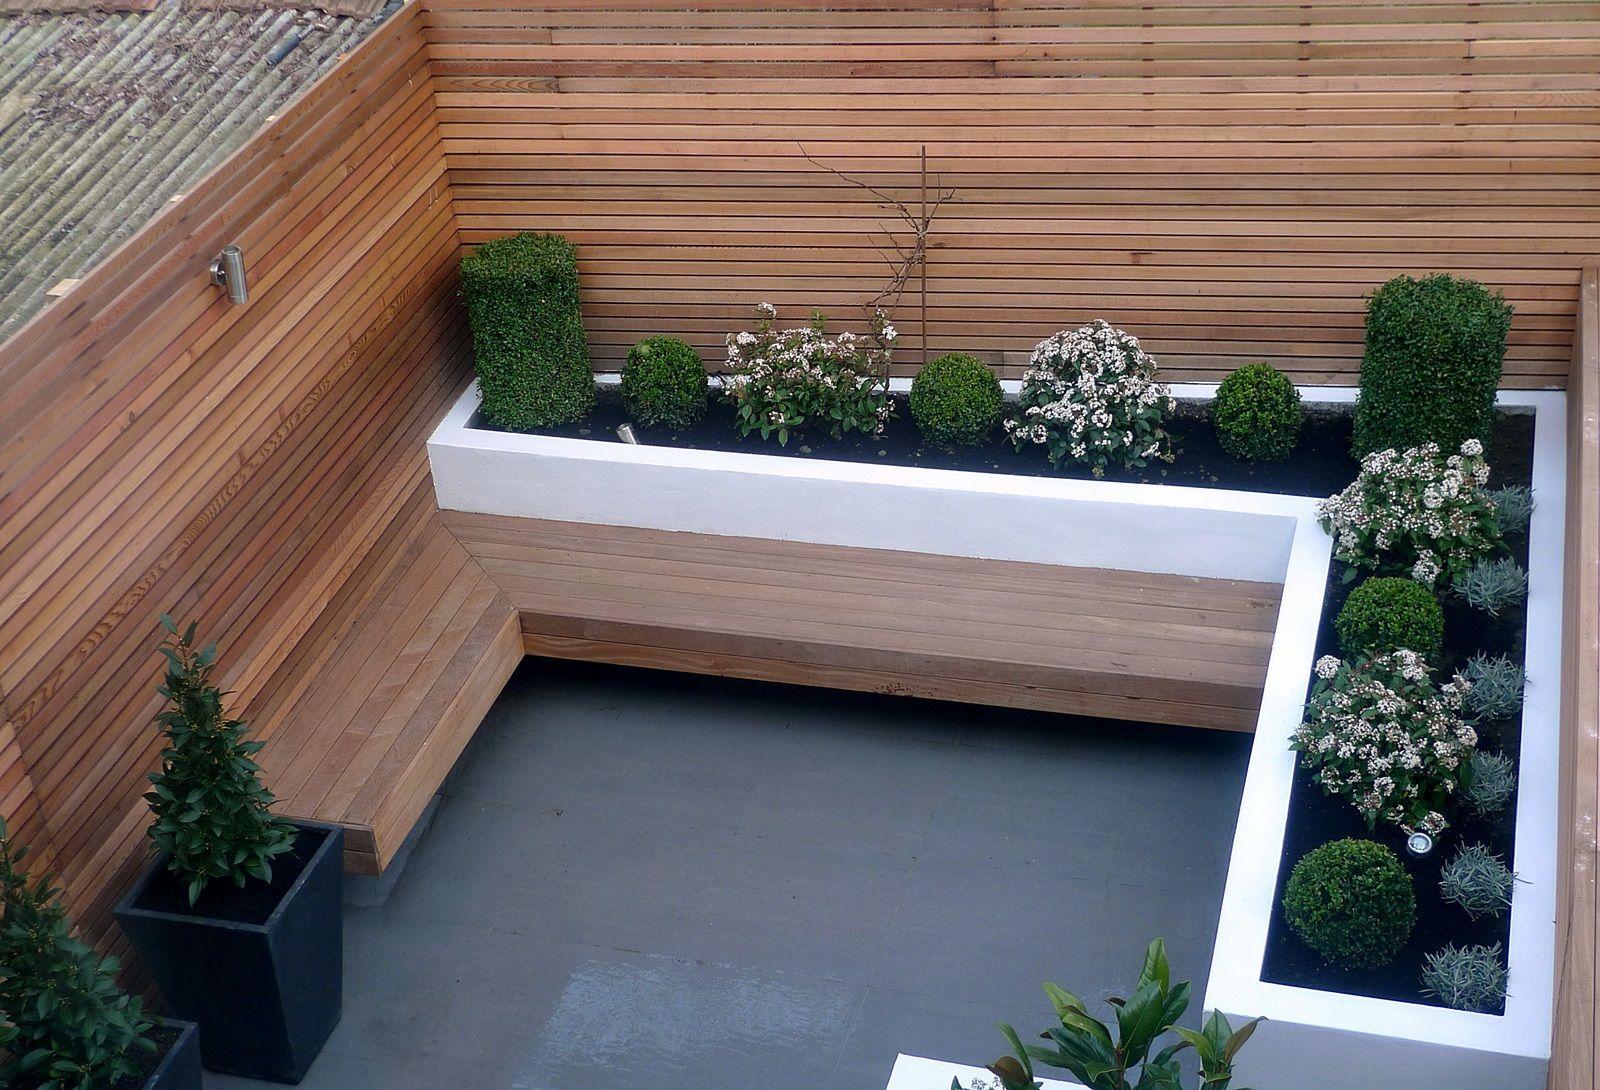 Garden Design Designer Clapham Balham Battersea Small Low Maintenance Modern Garden 5 Kert